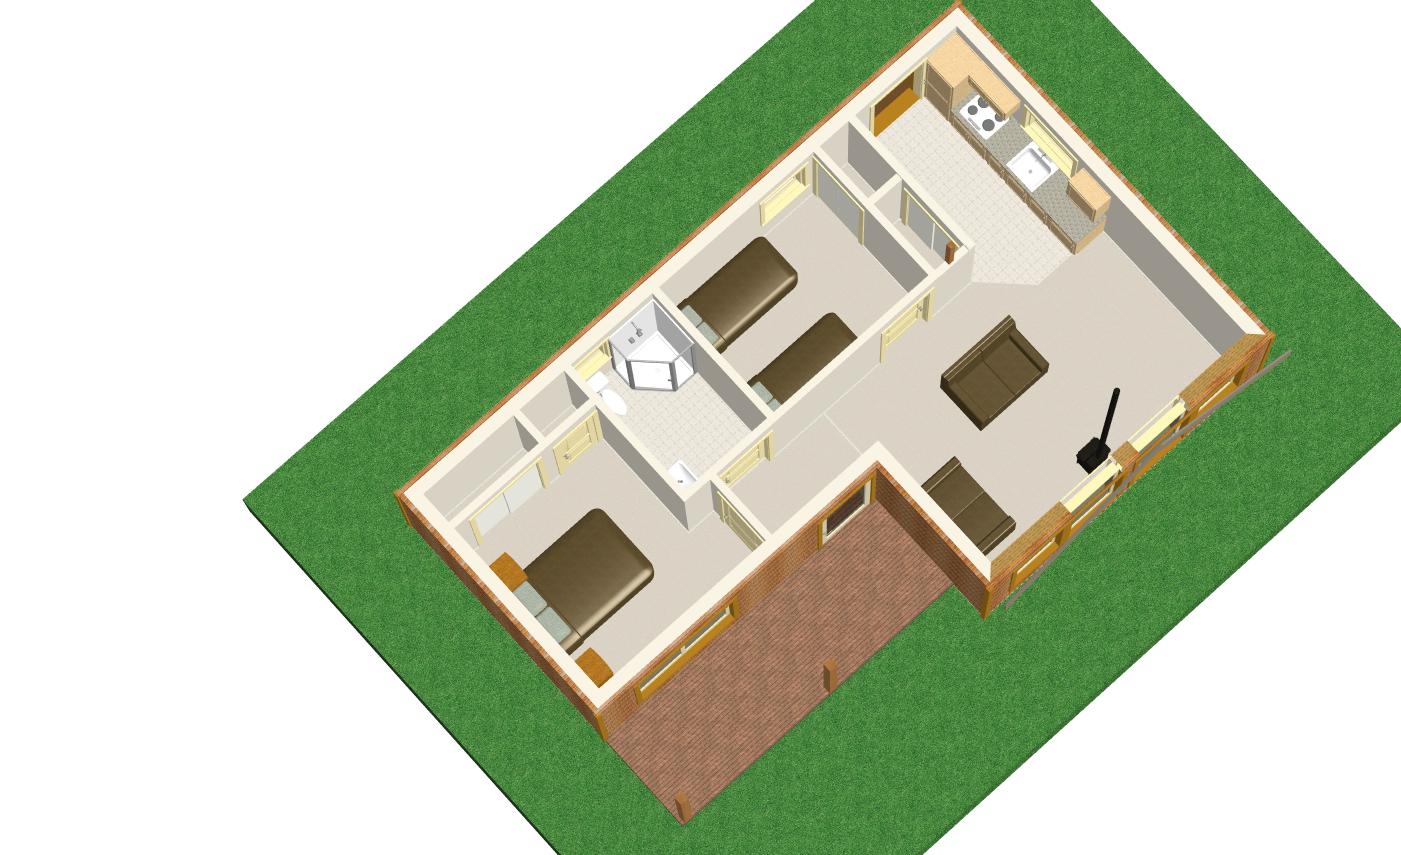 Ythan - 3D Cutaway